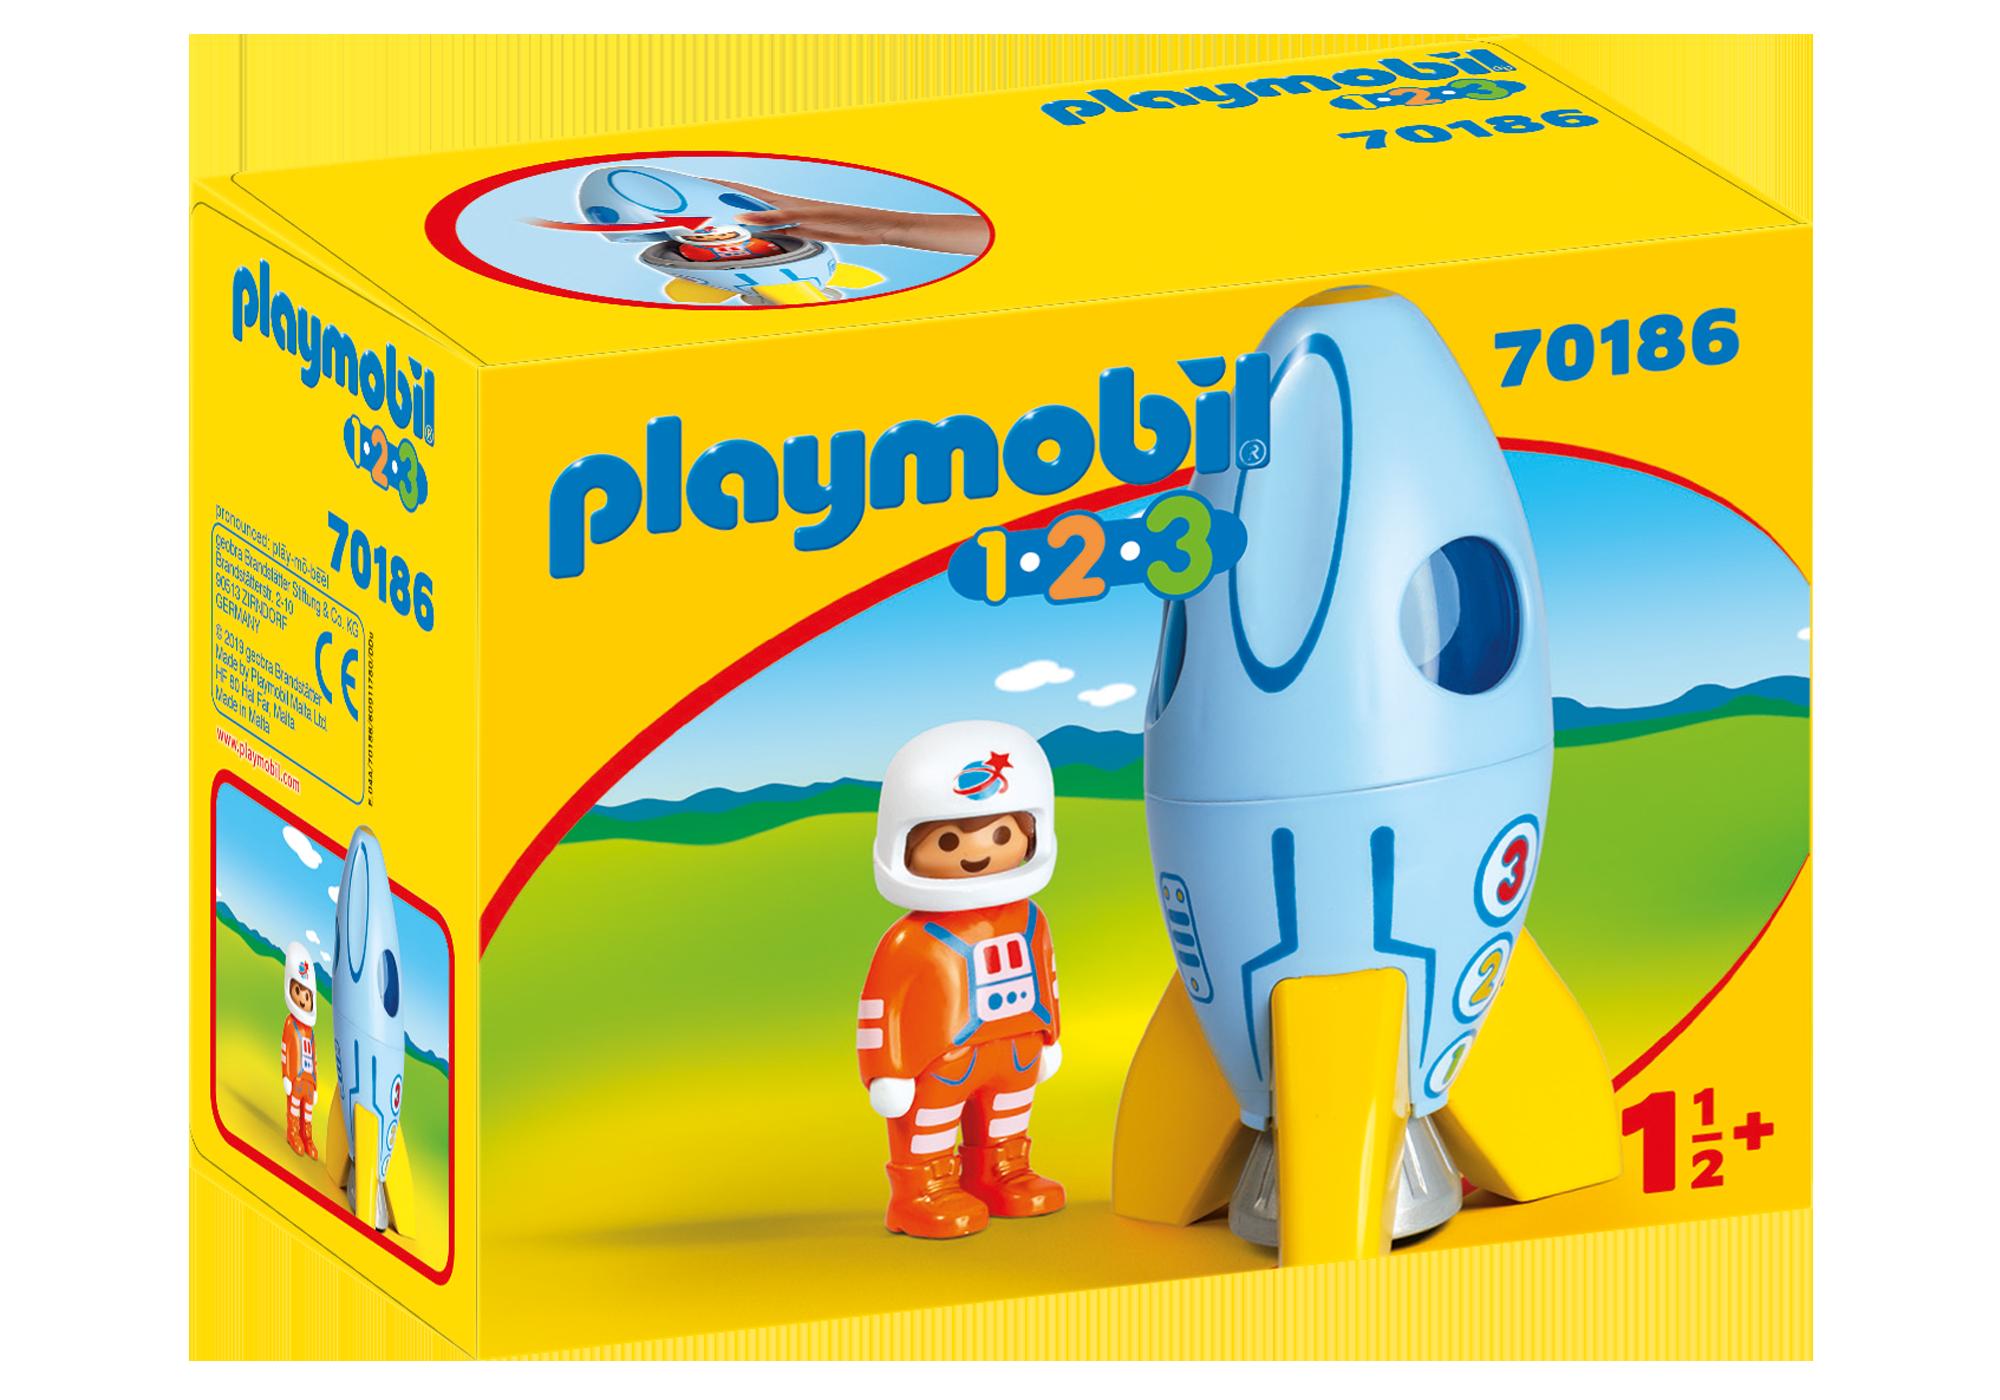 http://media.playmobil.com/i/playmobil/70186_product_box_front/Razzo con astronauta 1.2.3